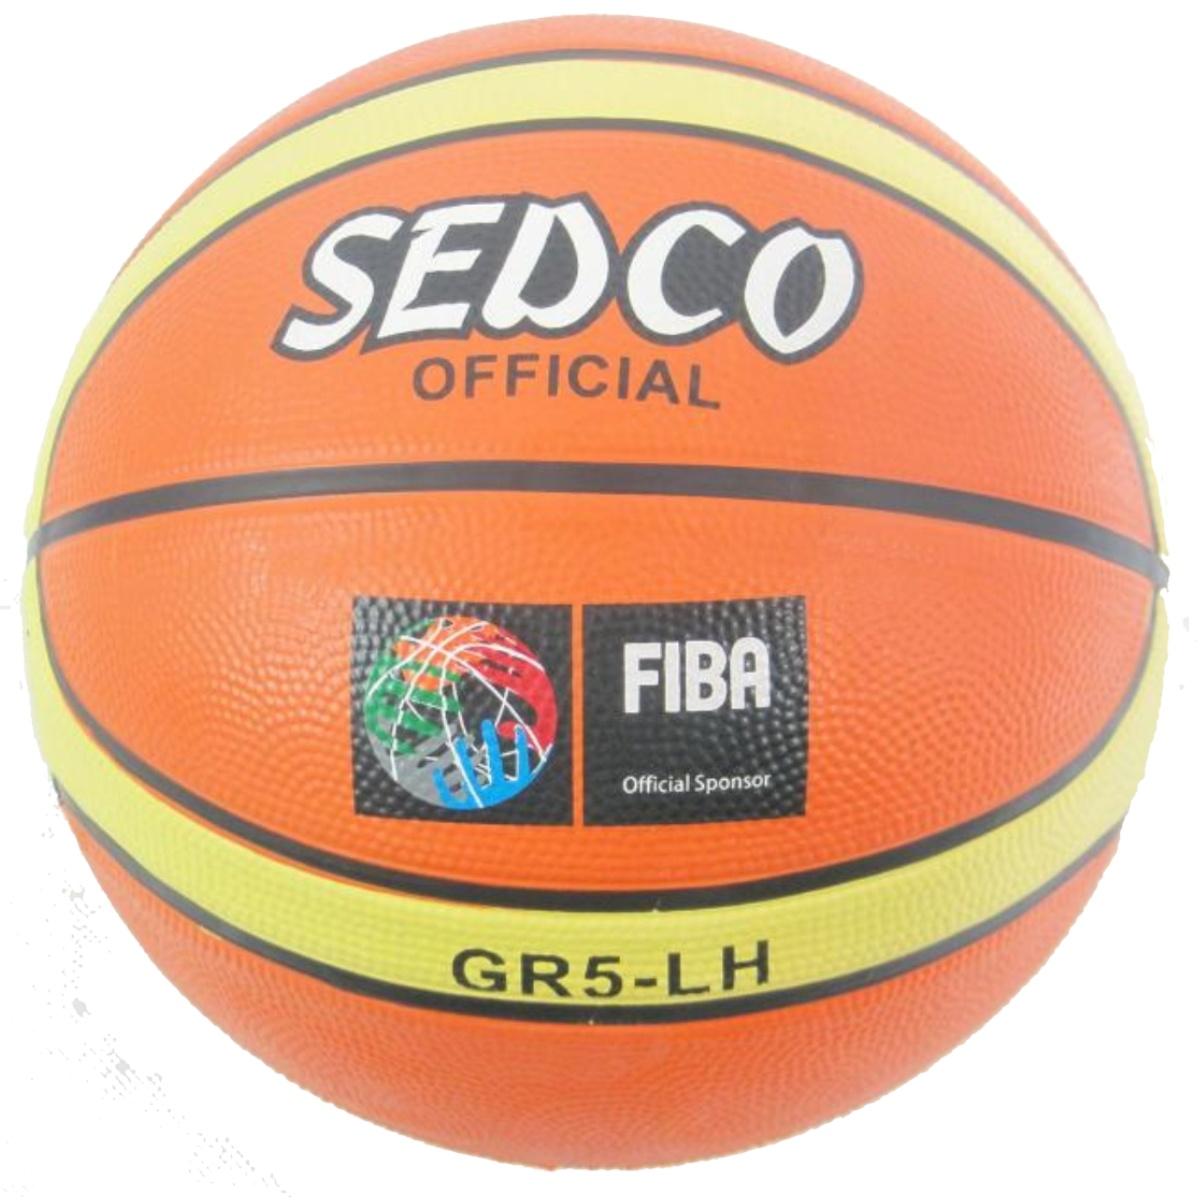 Basketbalový míč SEDCO Orange Super 5